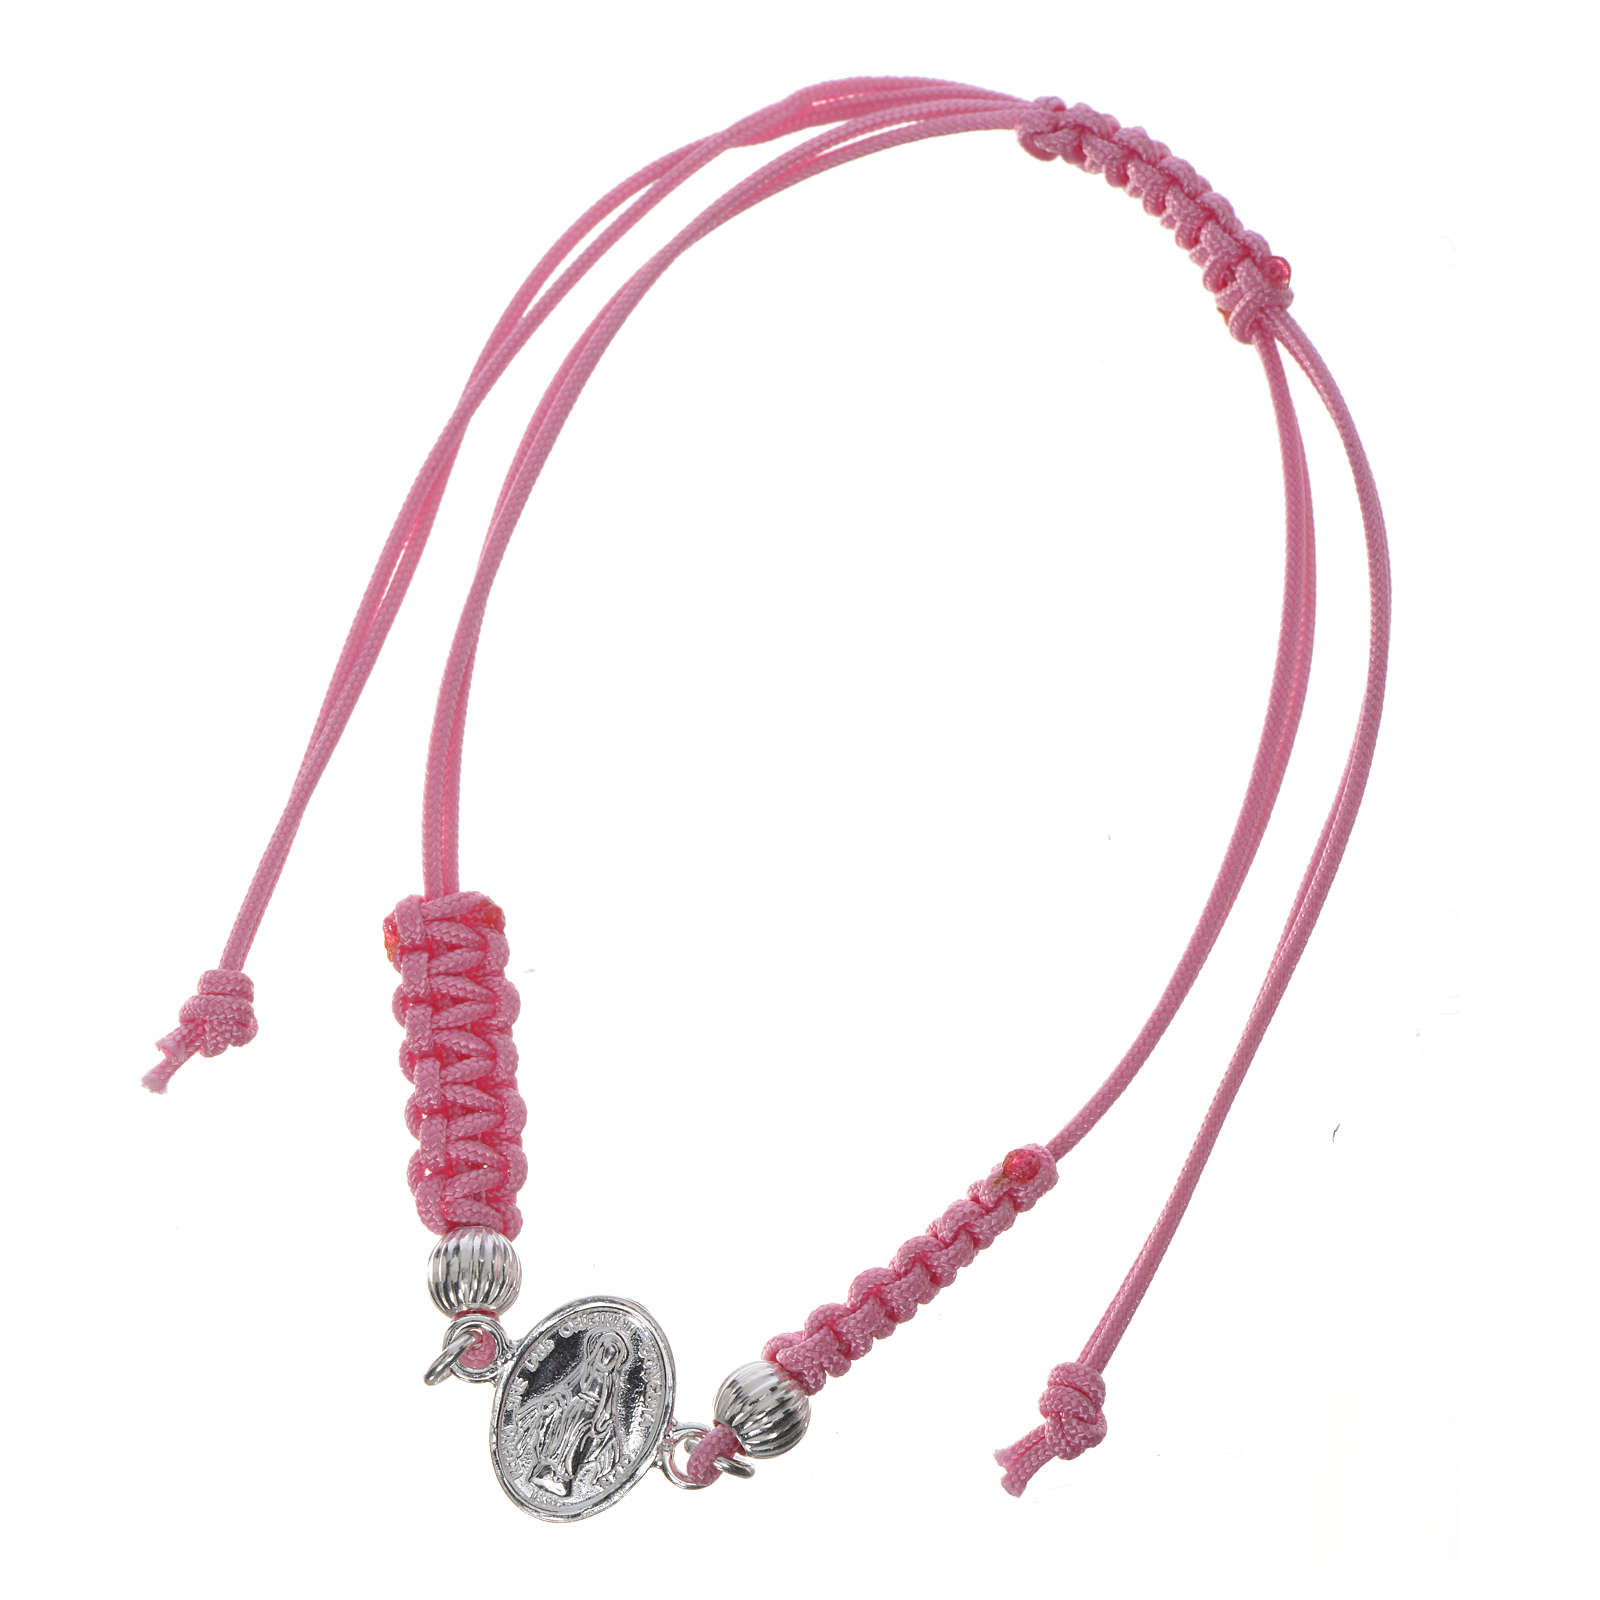 Bracelet Miraculeuse corde rose argent 800 4